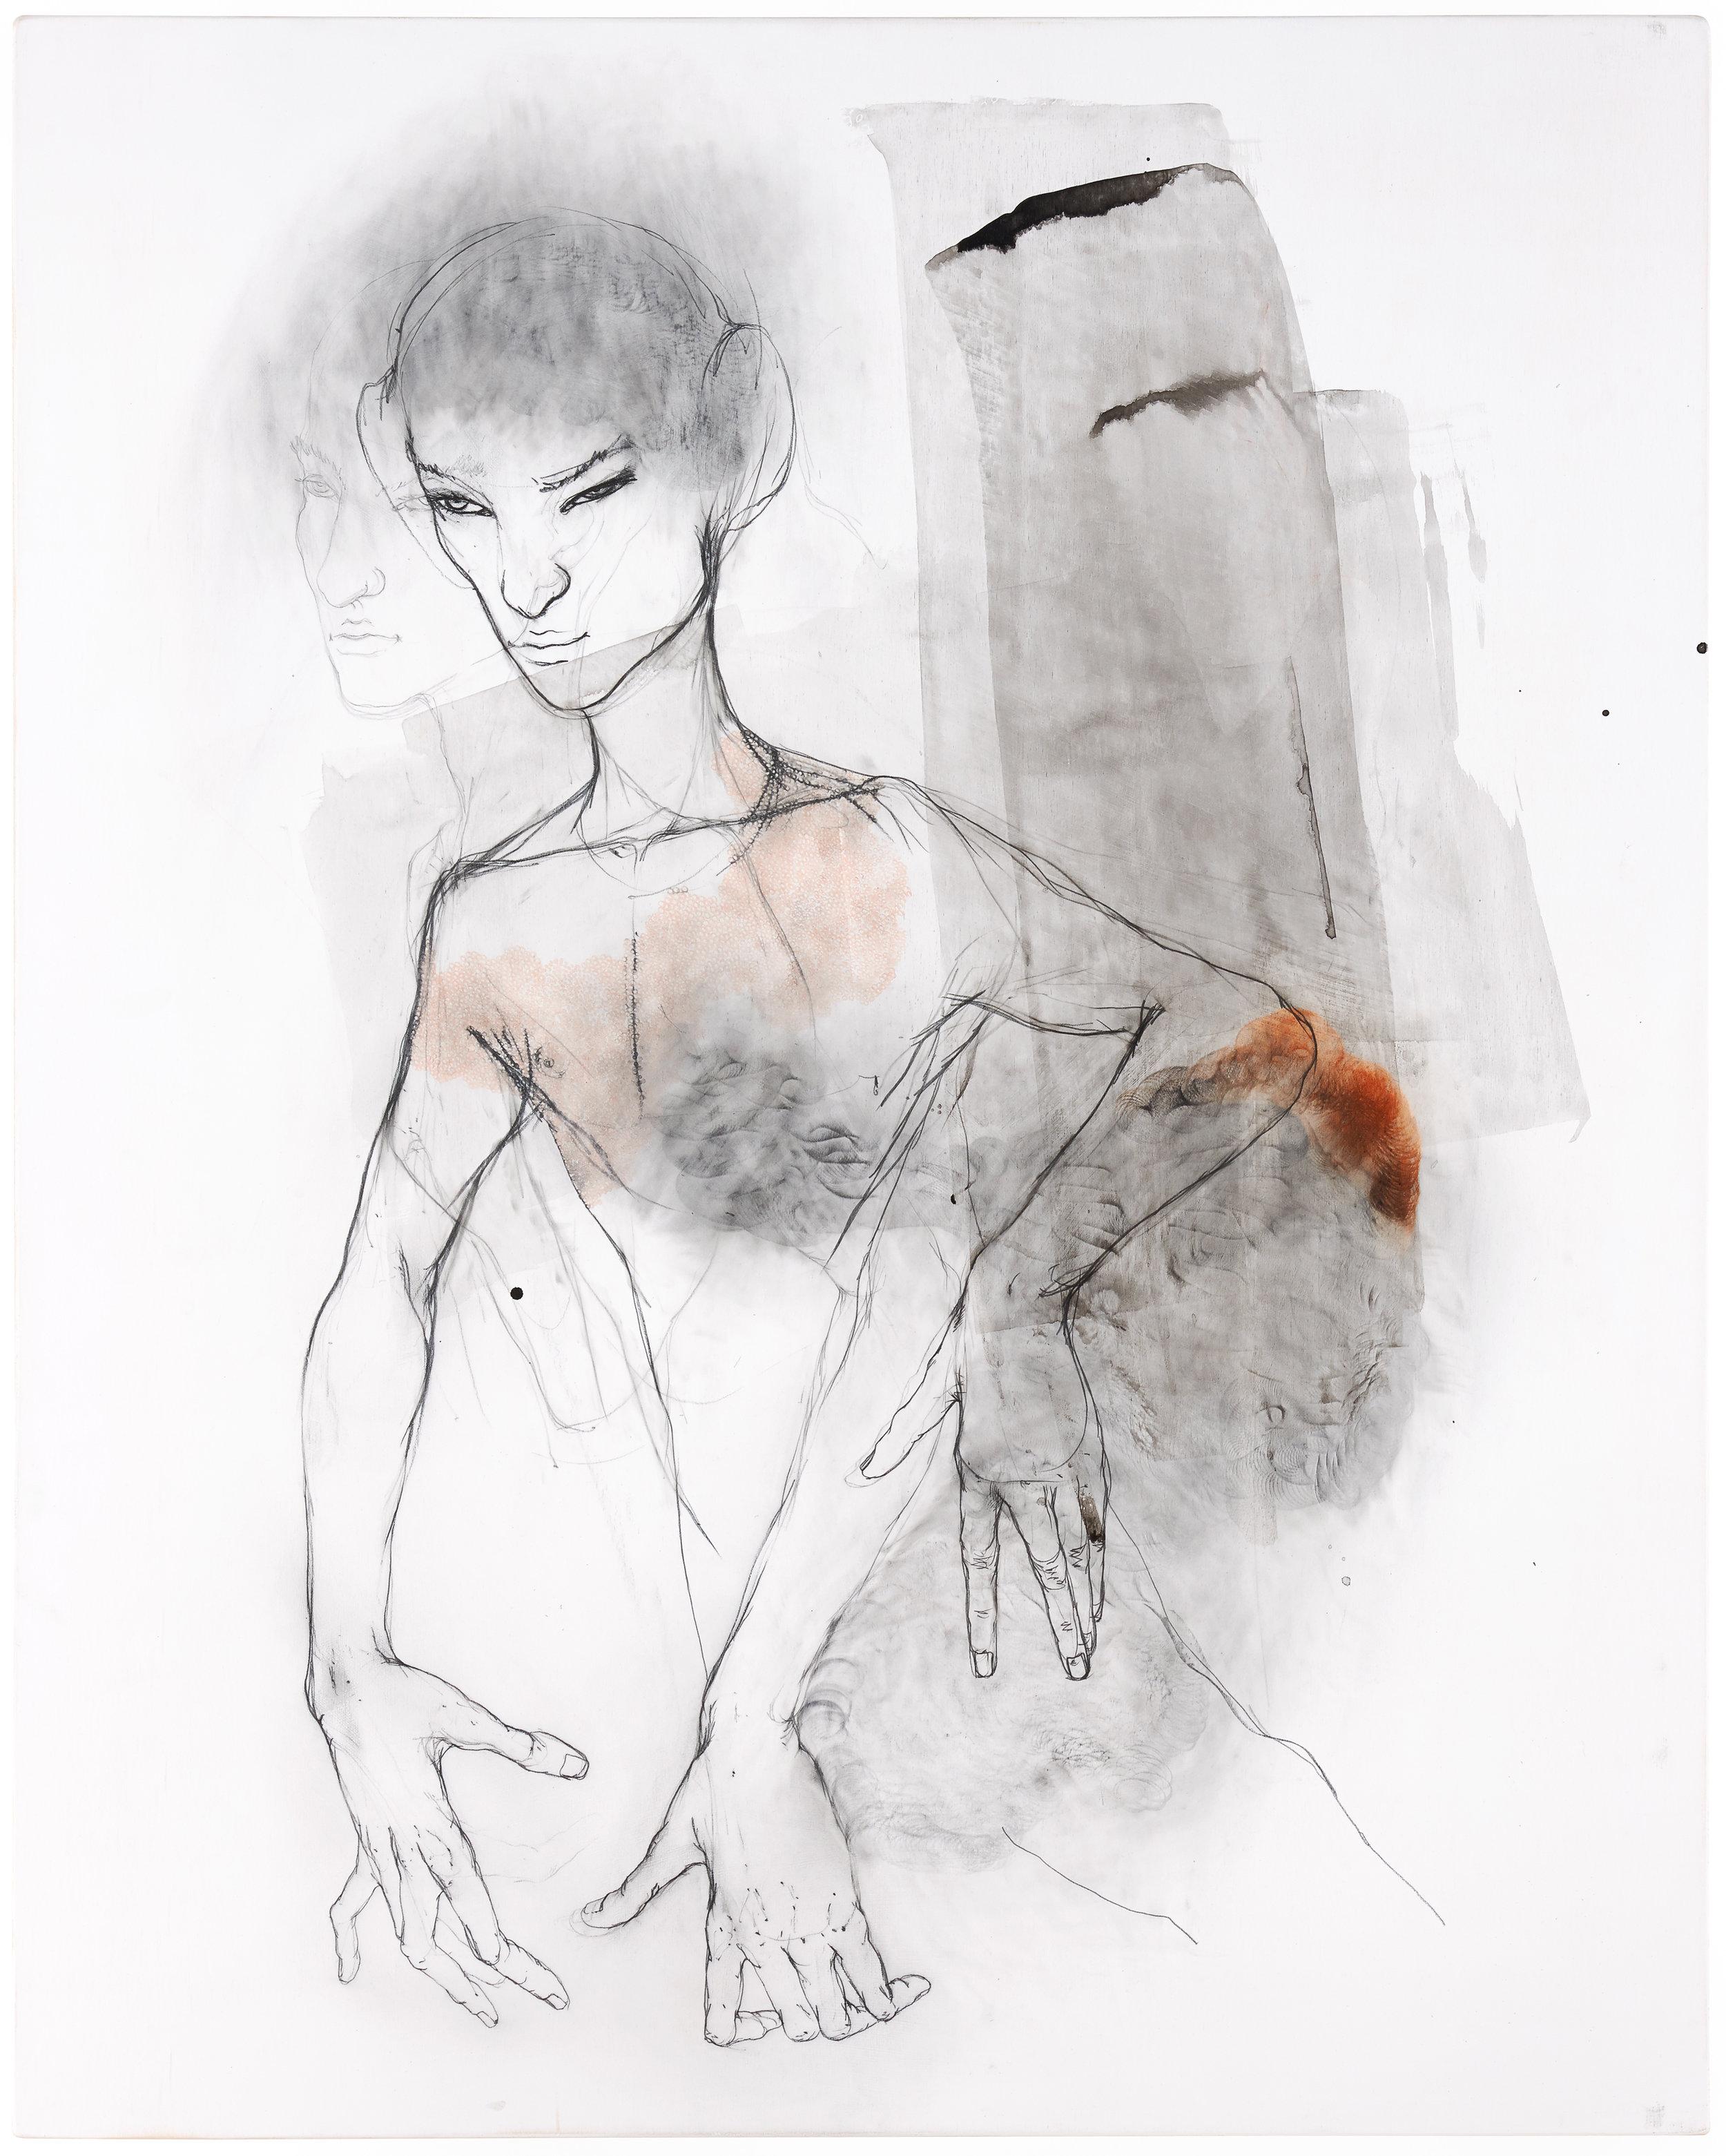 Peter Senoner, Folliastri (Y14N03), 2018, graphite, pigment on beech, 100 x 80 cm